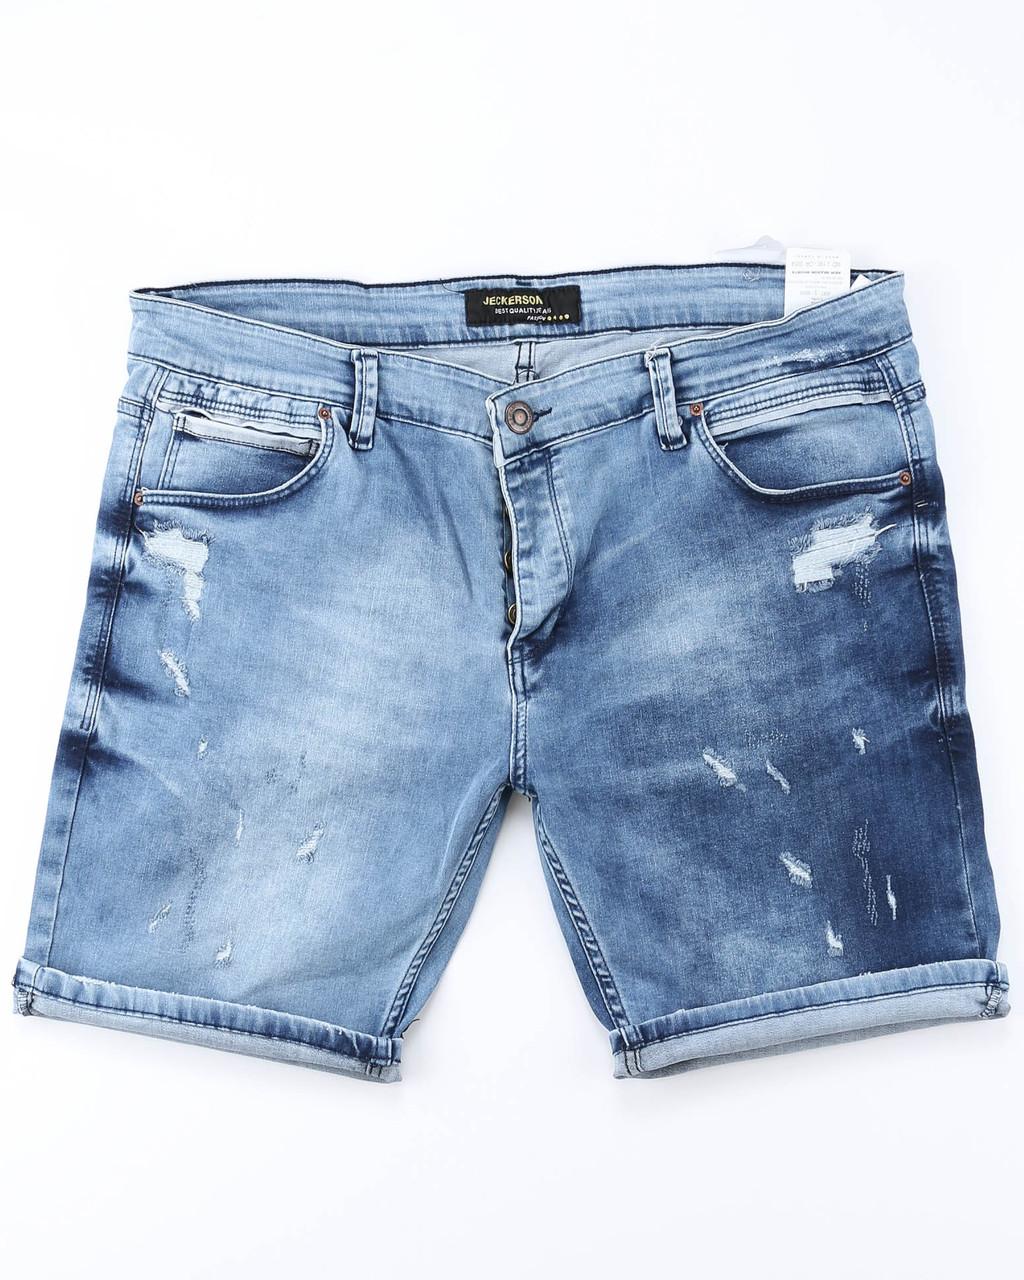 Шорты джинс MARIO 30(Р) 0054